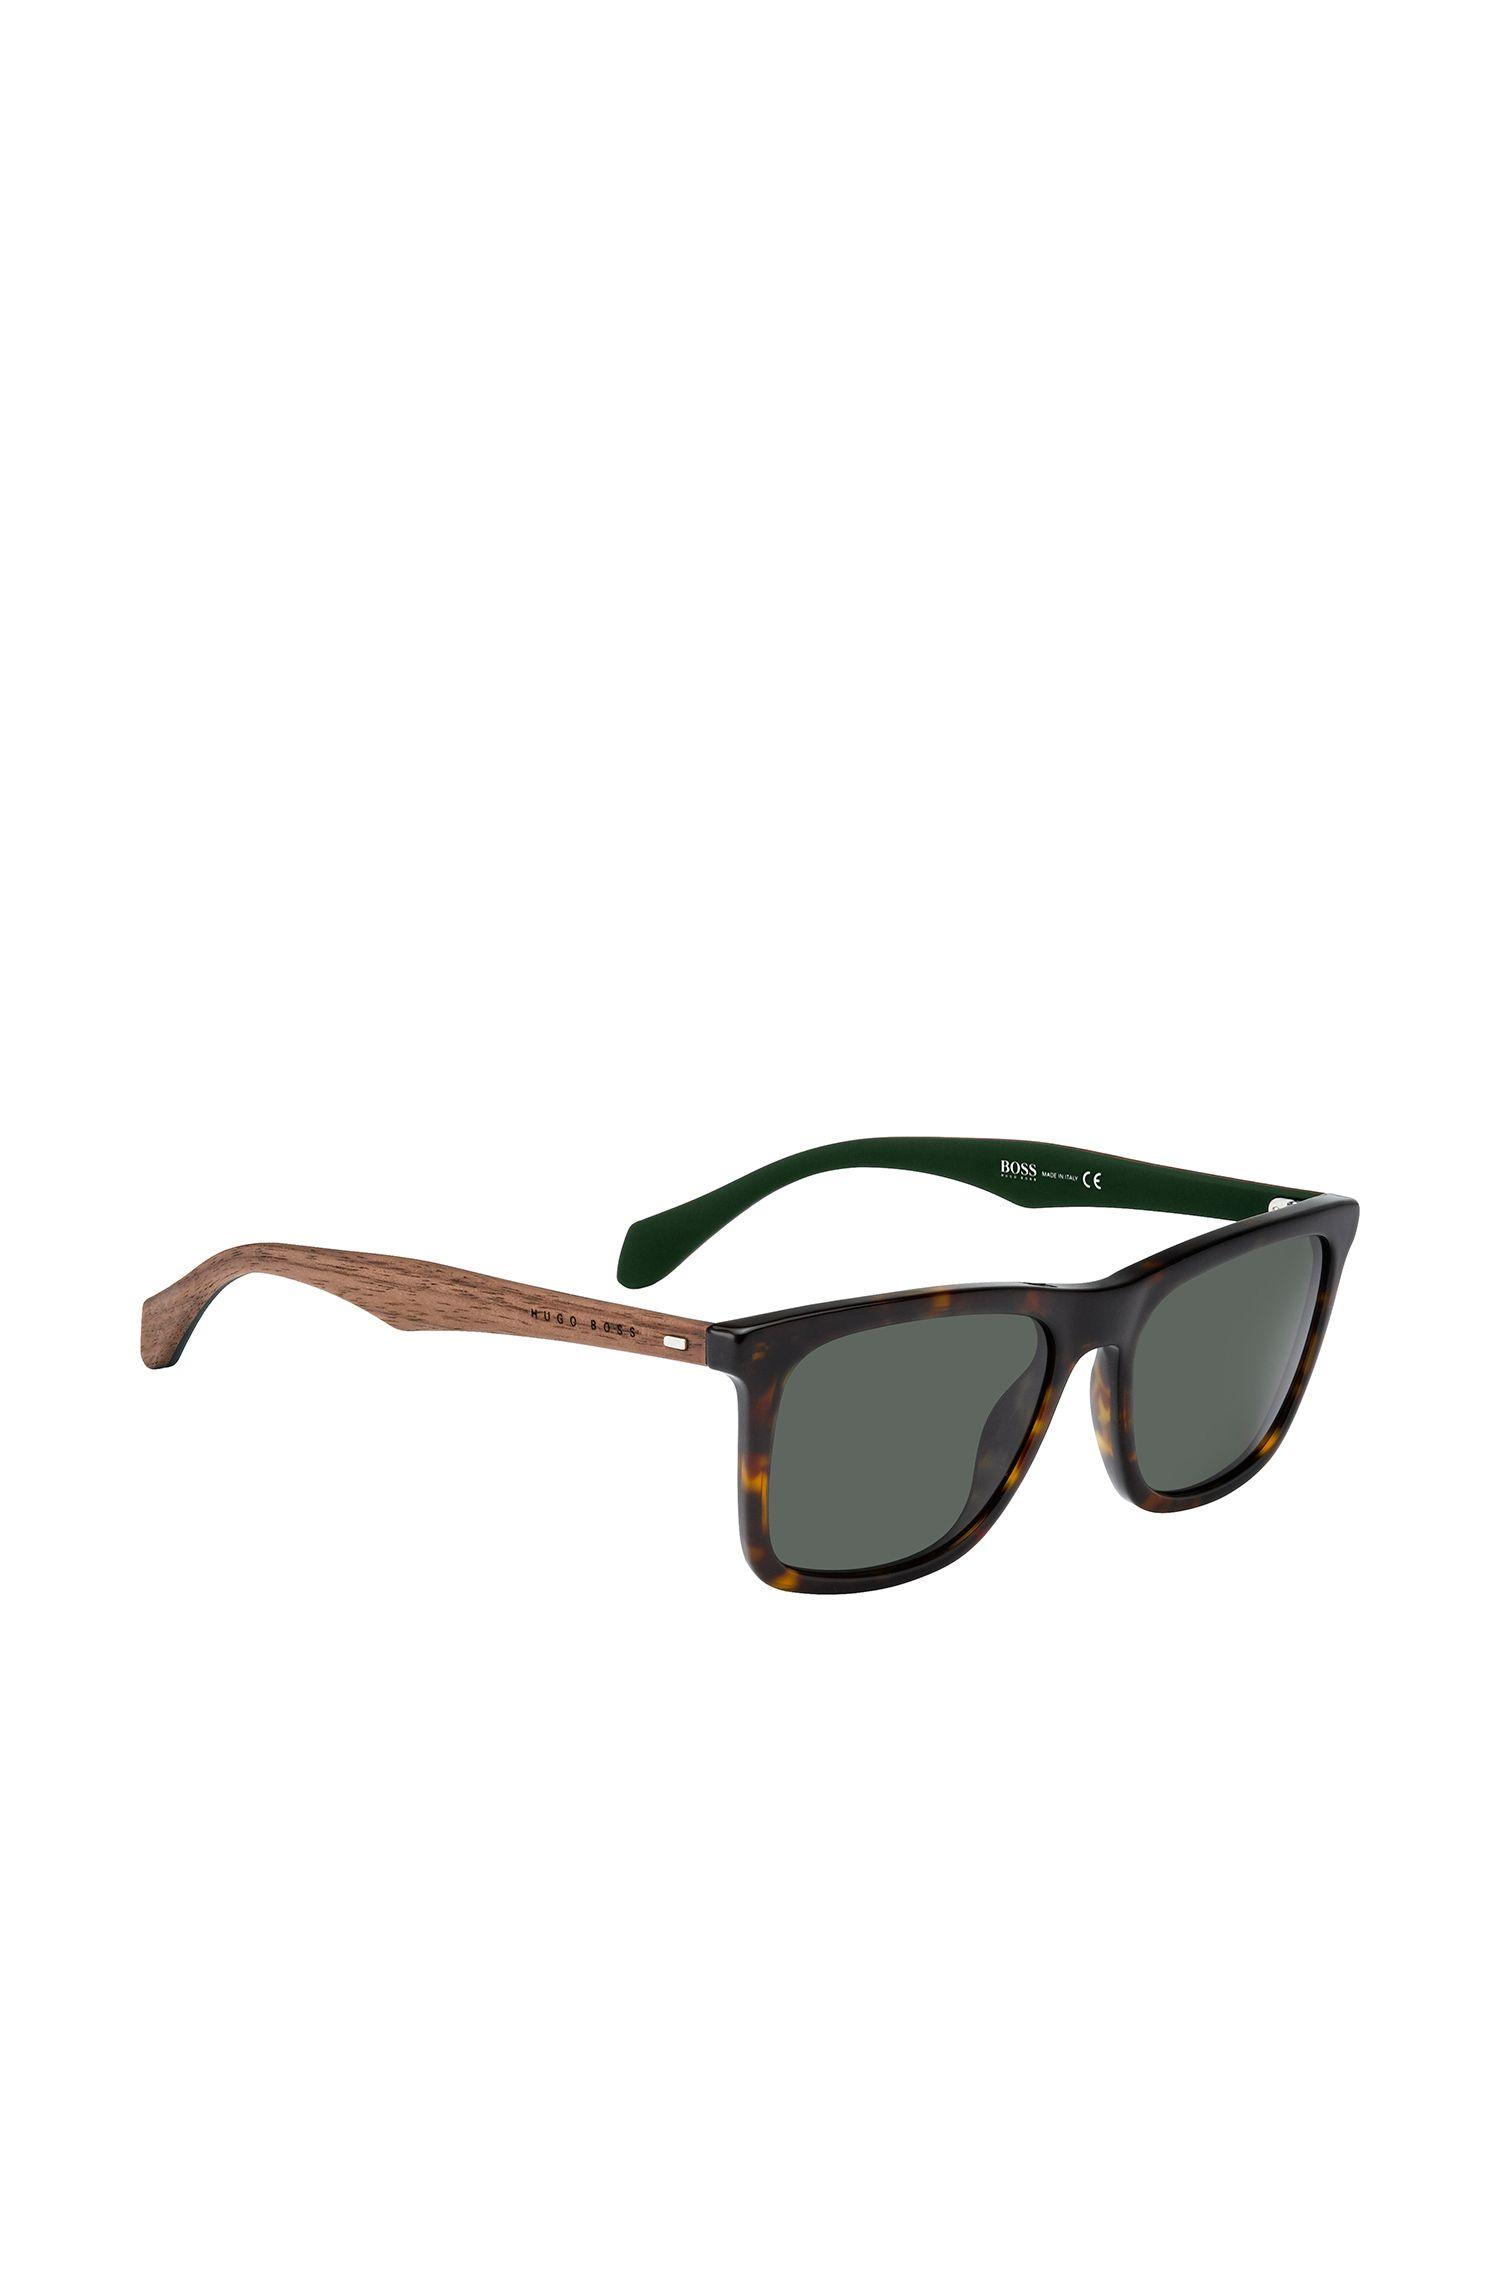 Gray Green Lens Walnut Sunglasses | BOSS 0776S